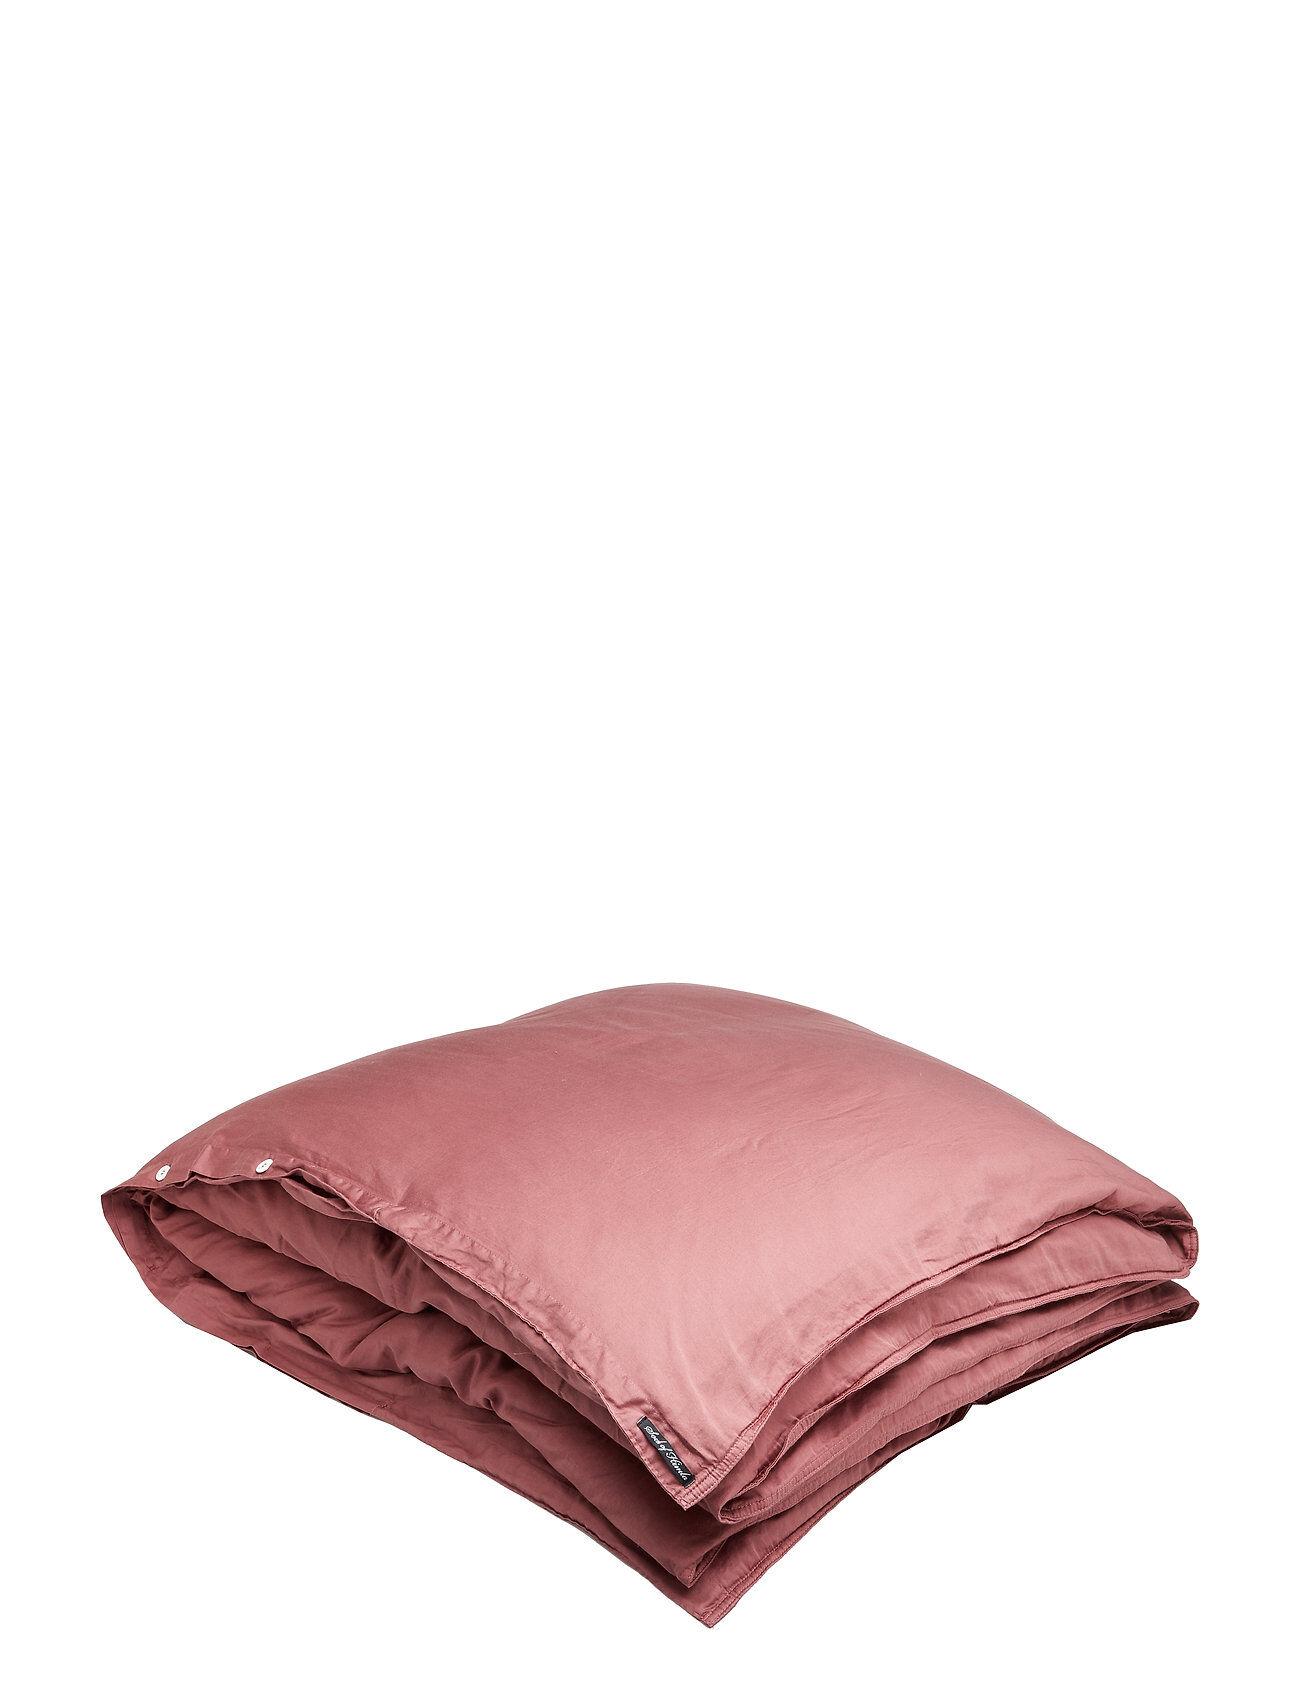 Himla Soul Of Himla Duvet Cover Home Bedroom Duvetcovers Vaaleanpunainen Himla